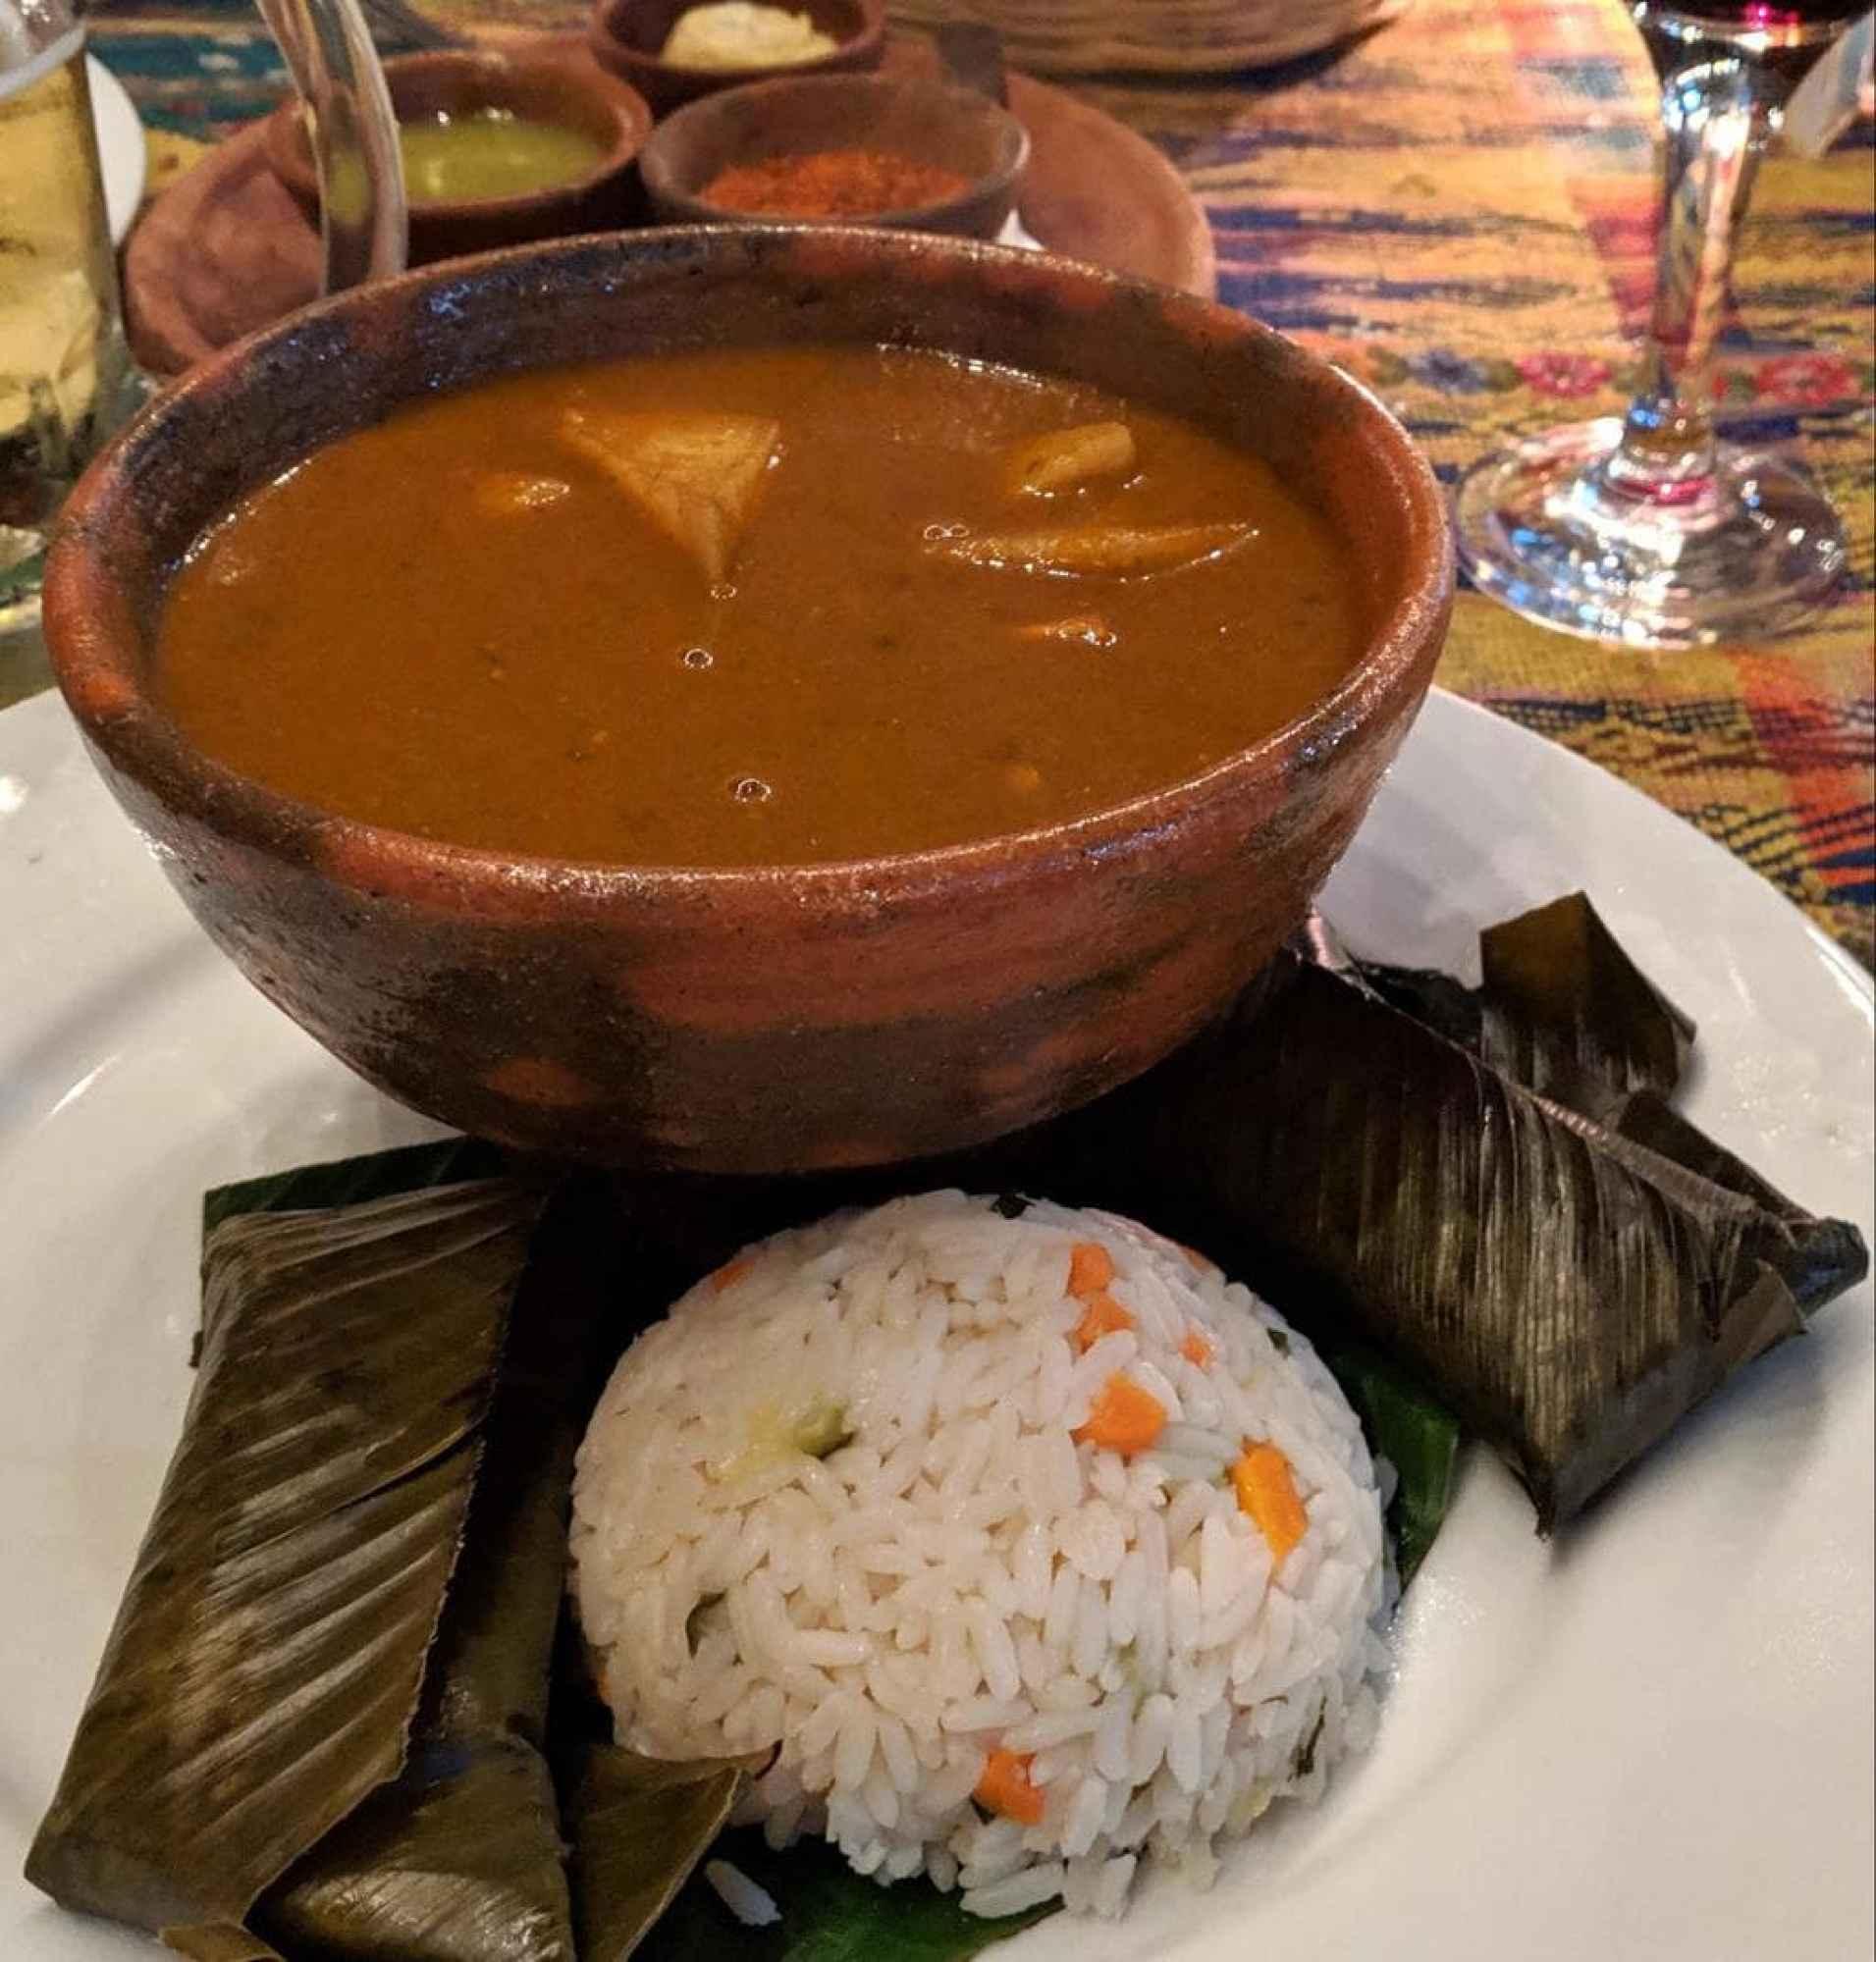 Pepian is informally considered Guatemala's national dish